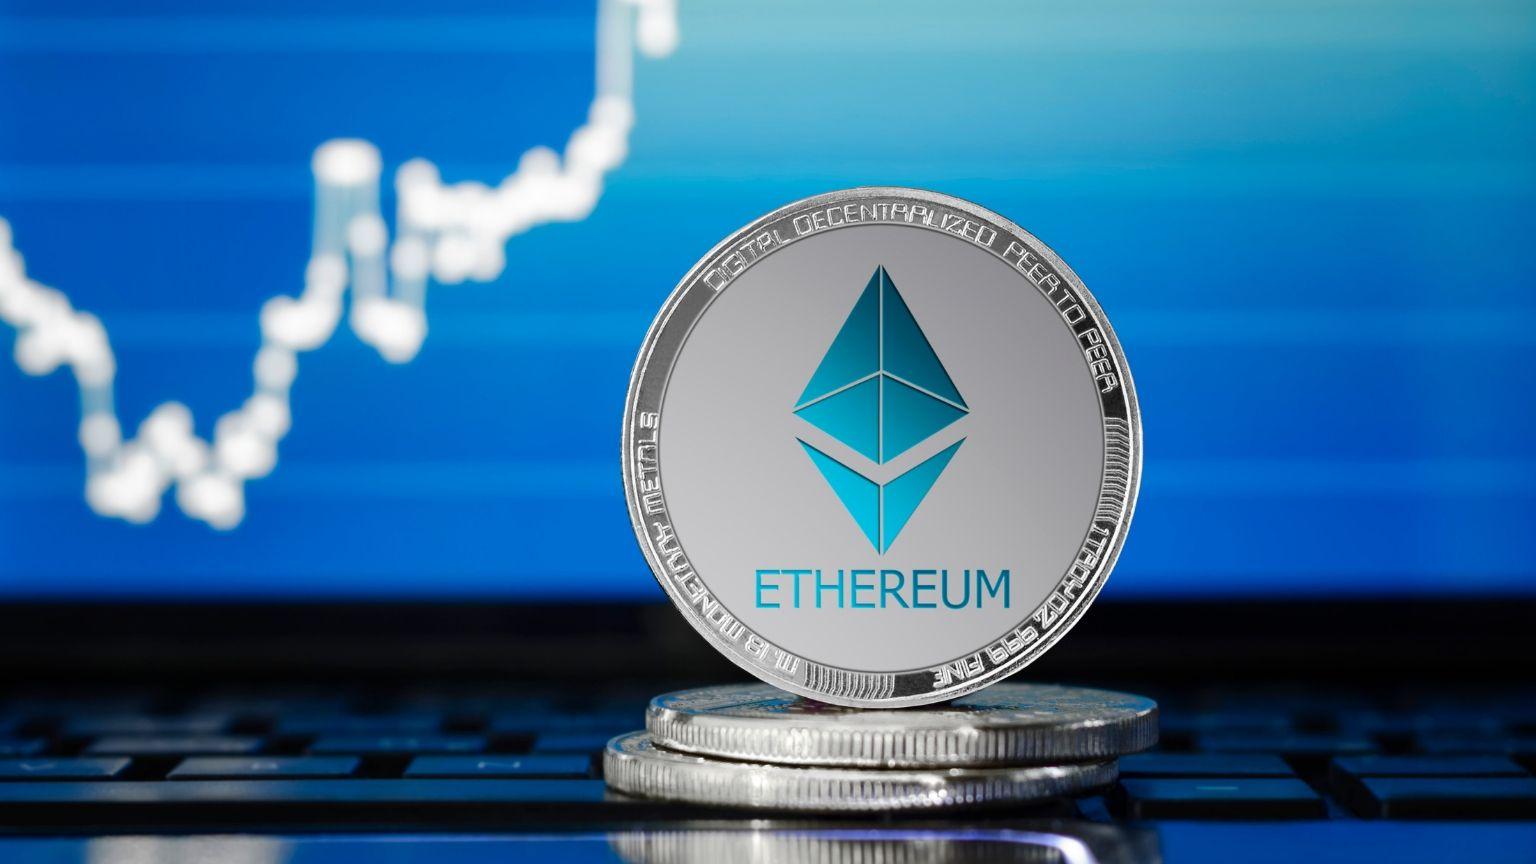 Ethereum and Binance Coin (BNB) Price Analysis